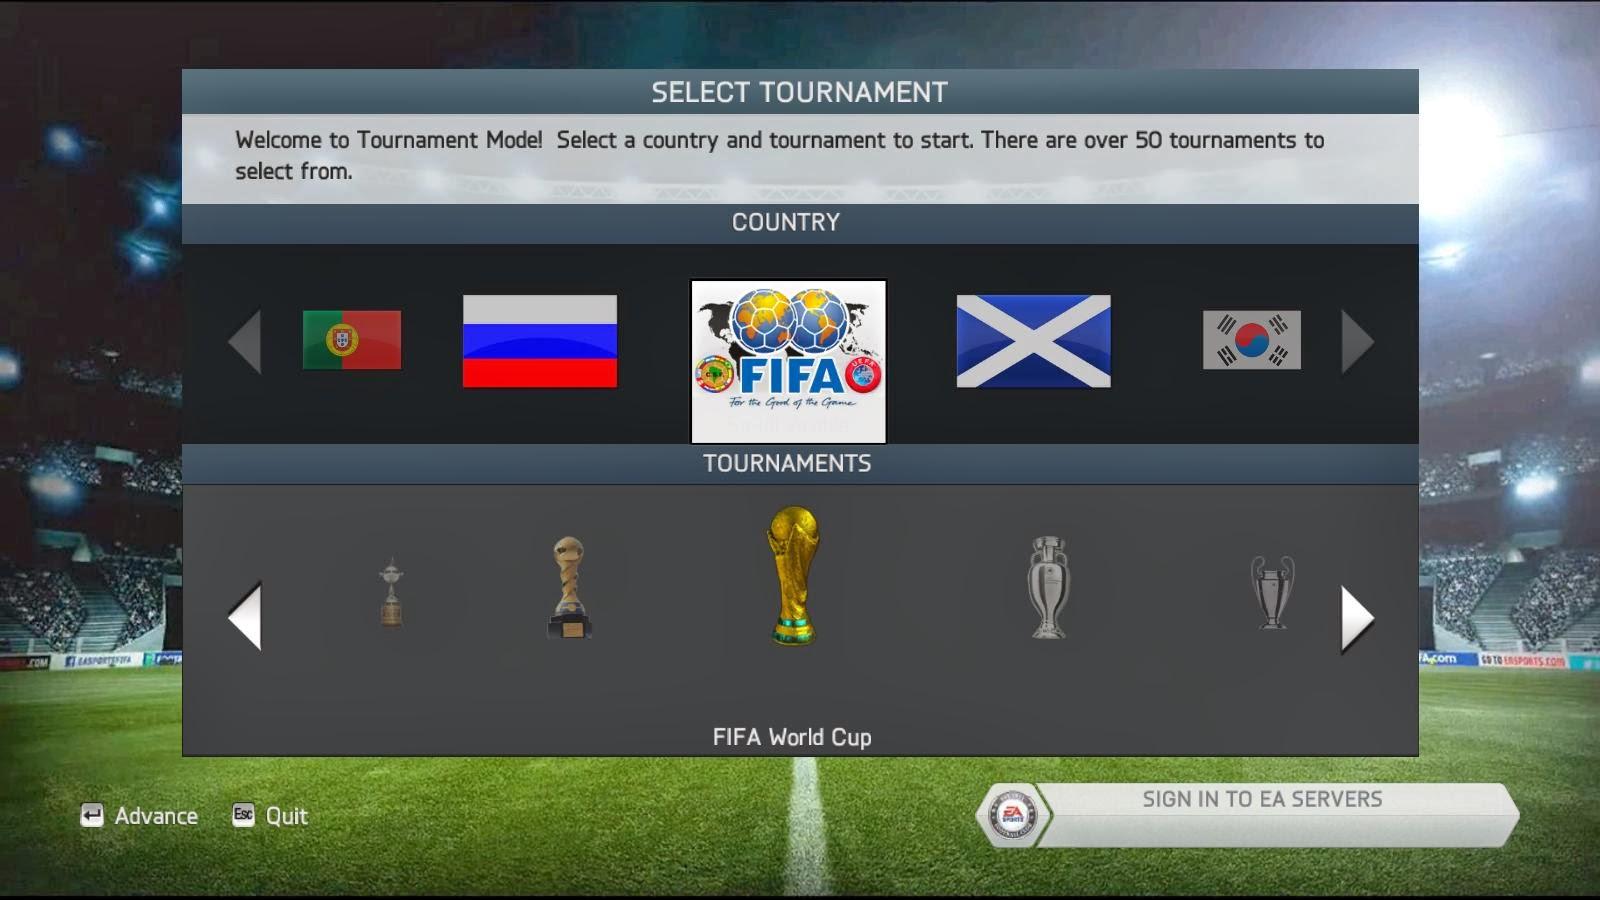 FIFA 14 ModdingWay Mod - 1 7 1 AIO and 1 8 0 | qaz